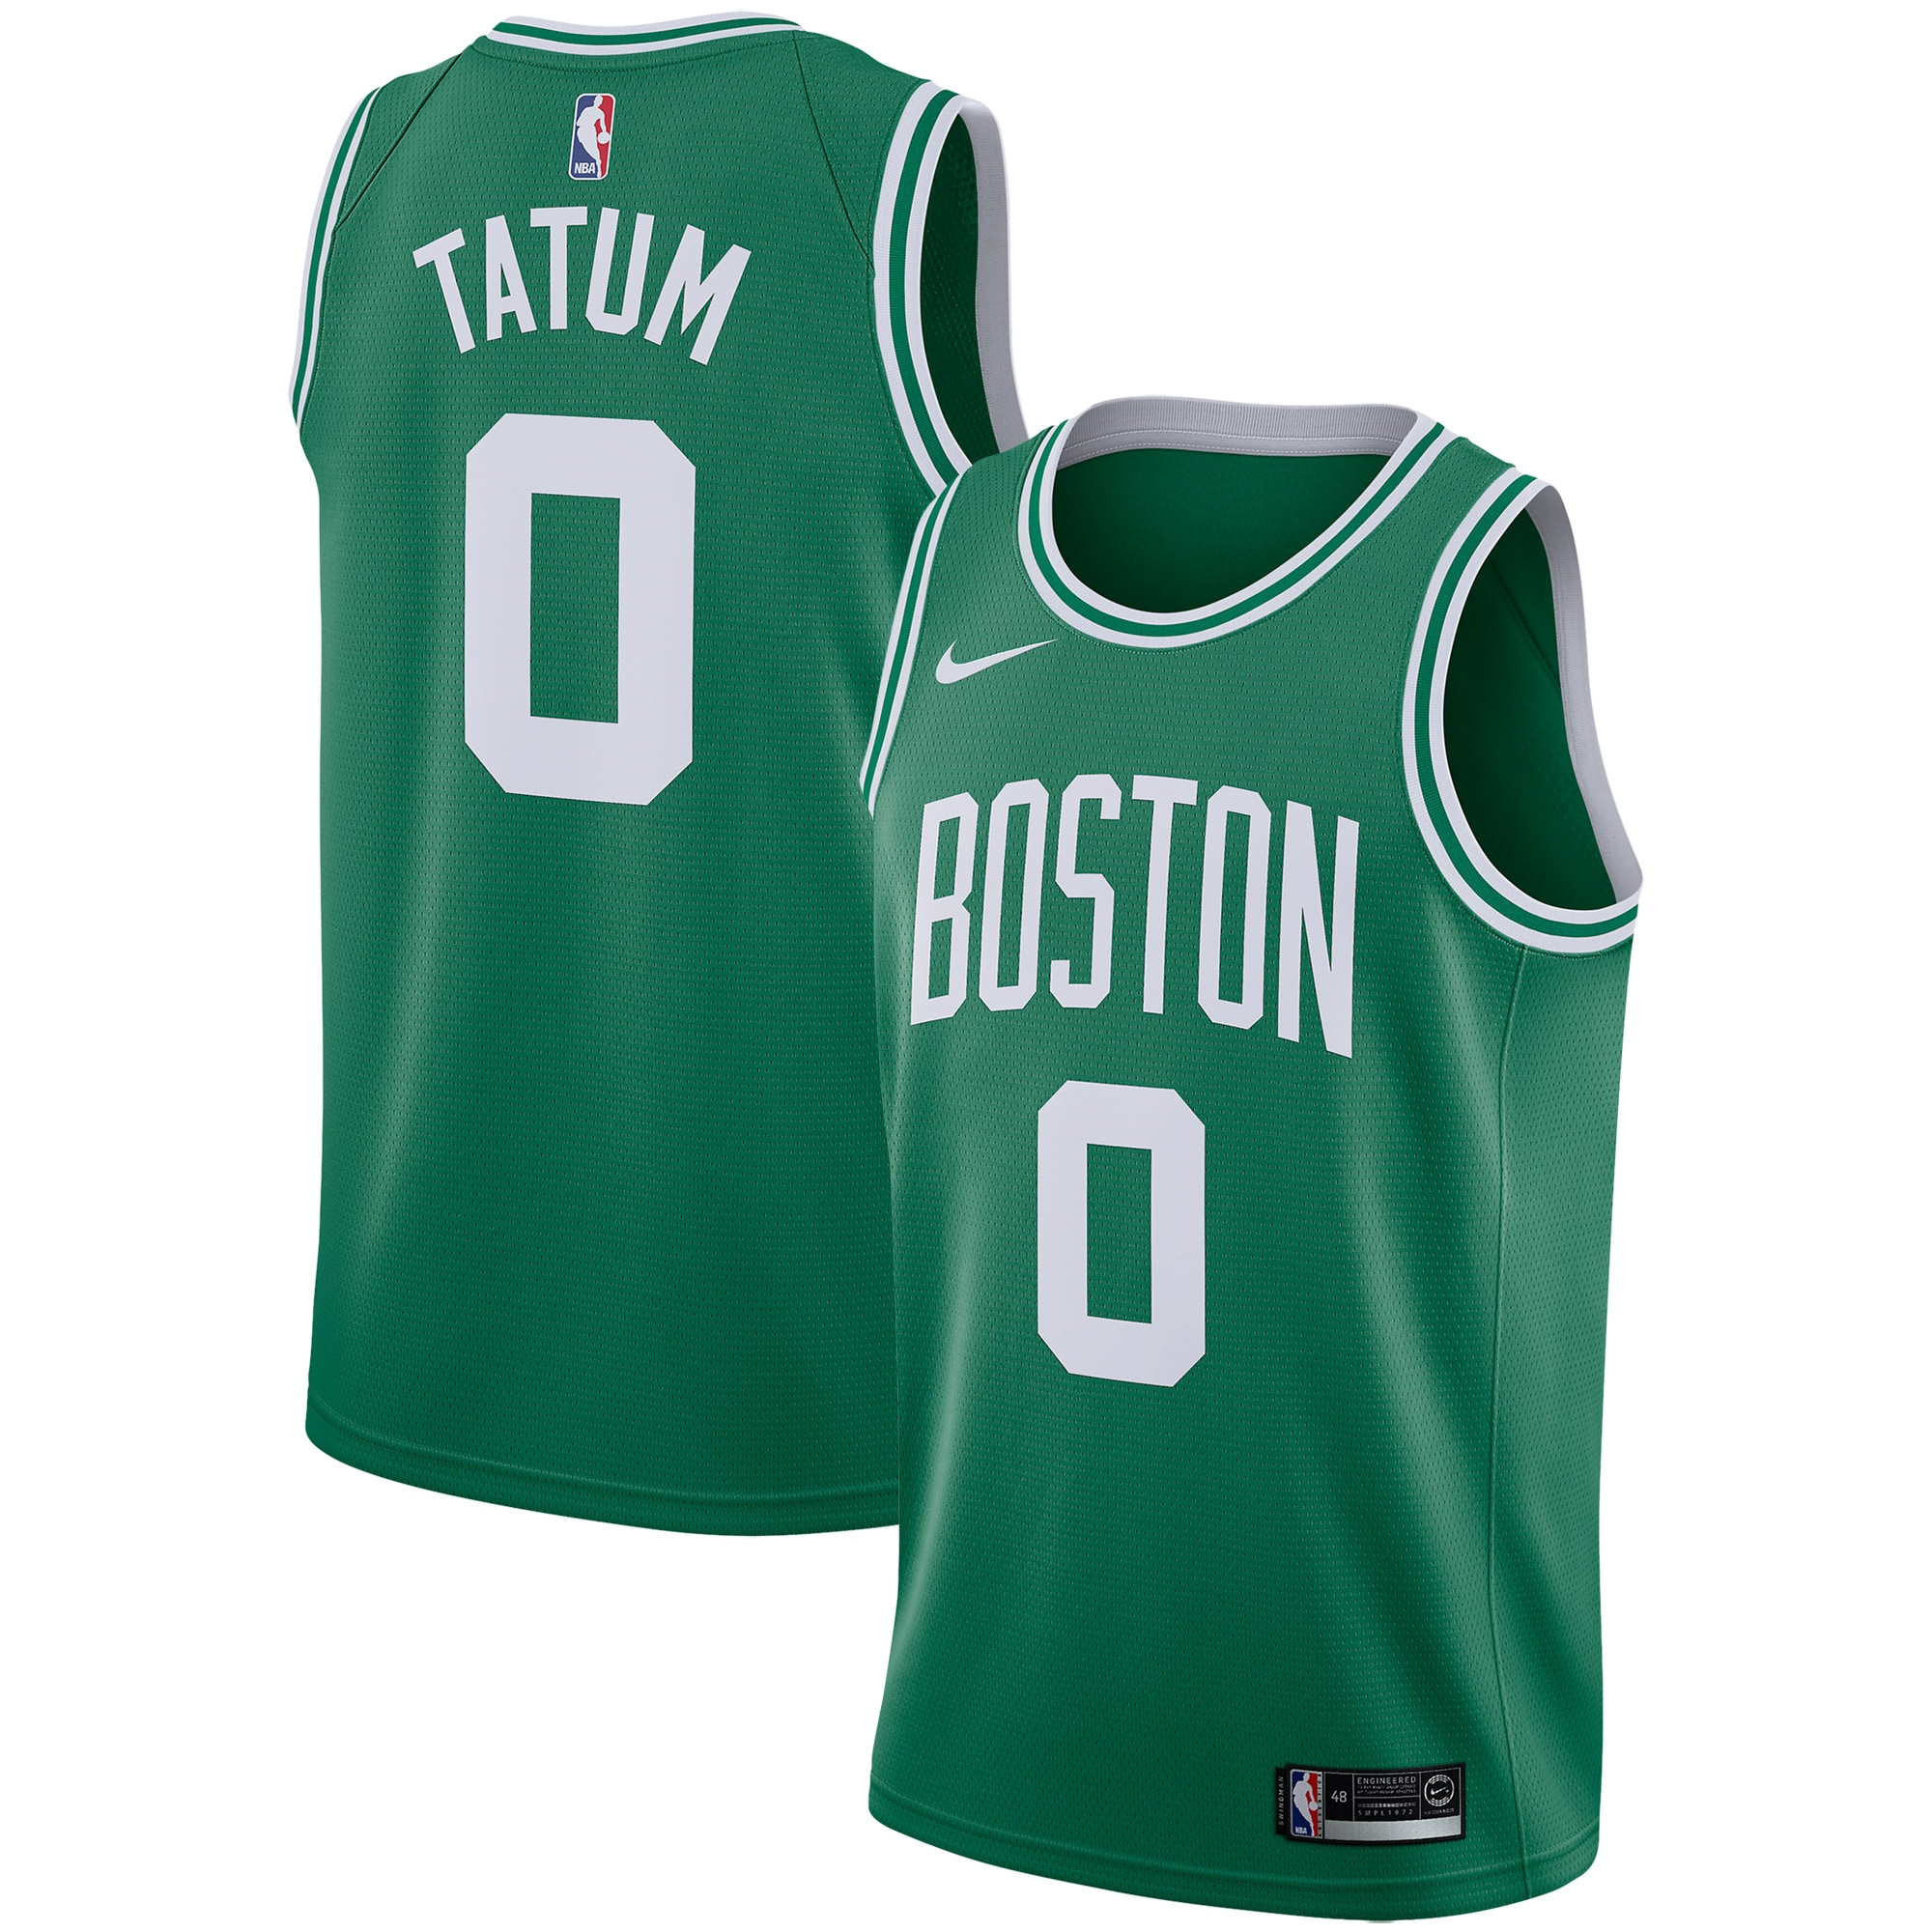 Jayson Tatum Boston Celtics Nike Swingman Jersey - Icon Edition - Green